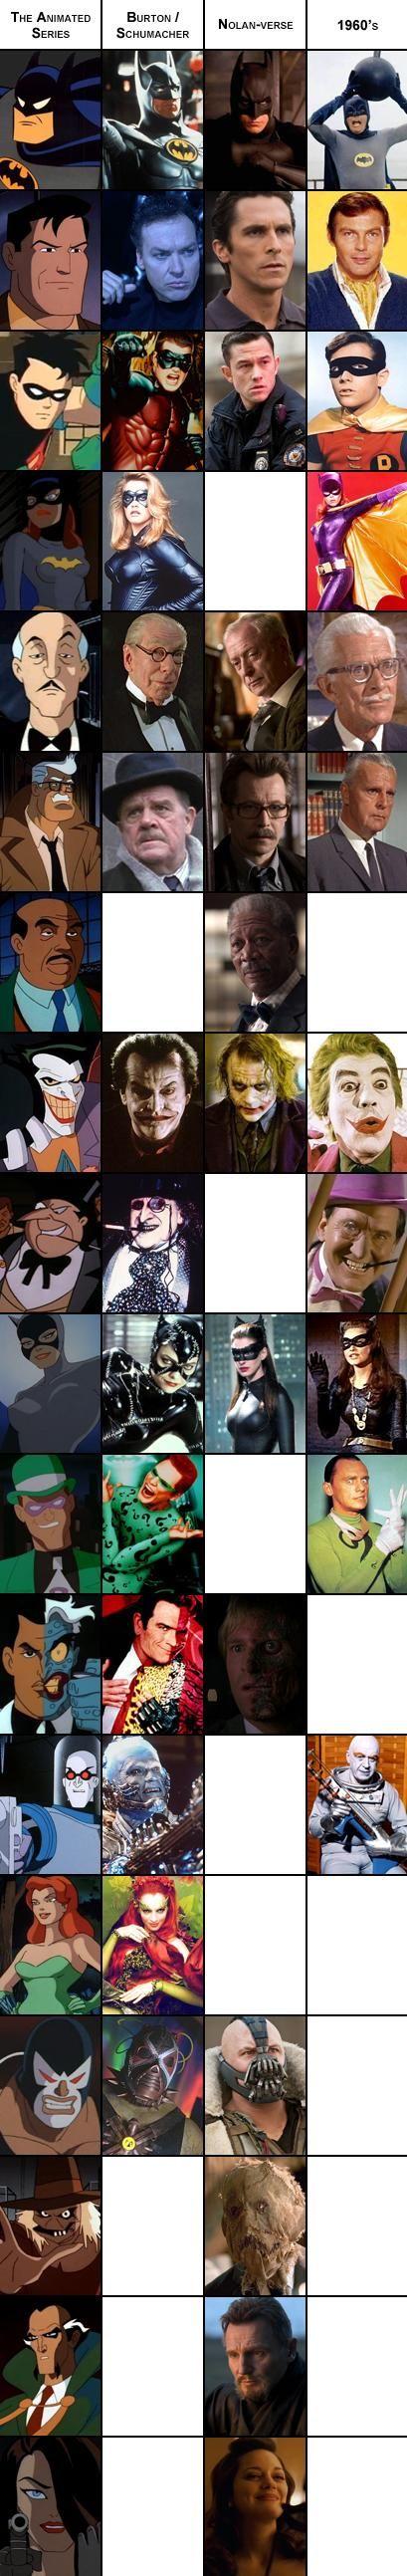 Visualized: Nolan-verse Batman cast vs Animated Series vs Other Film.  Nolan > everything else